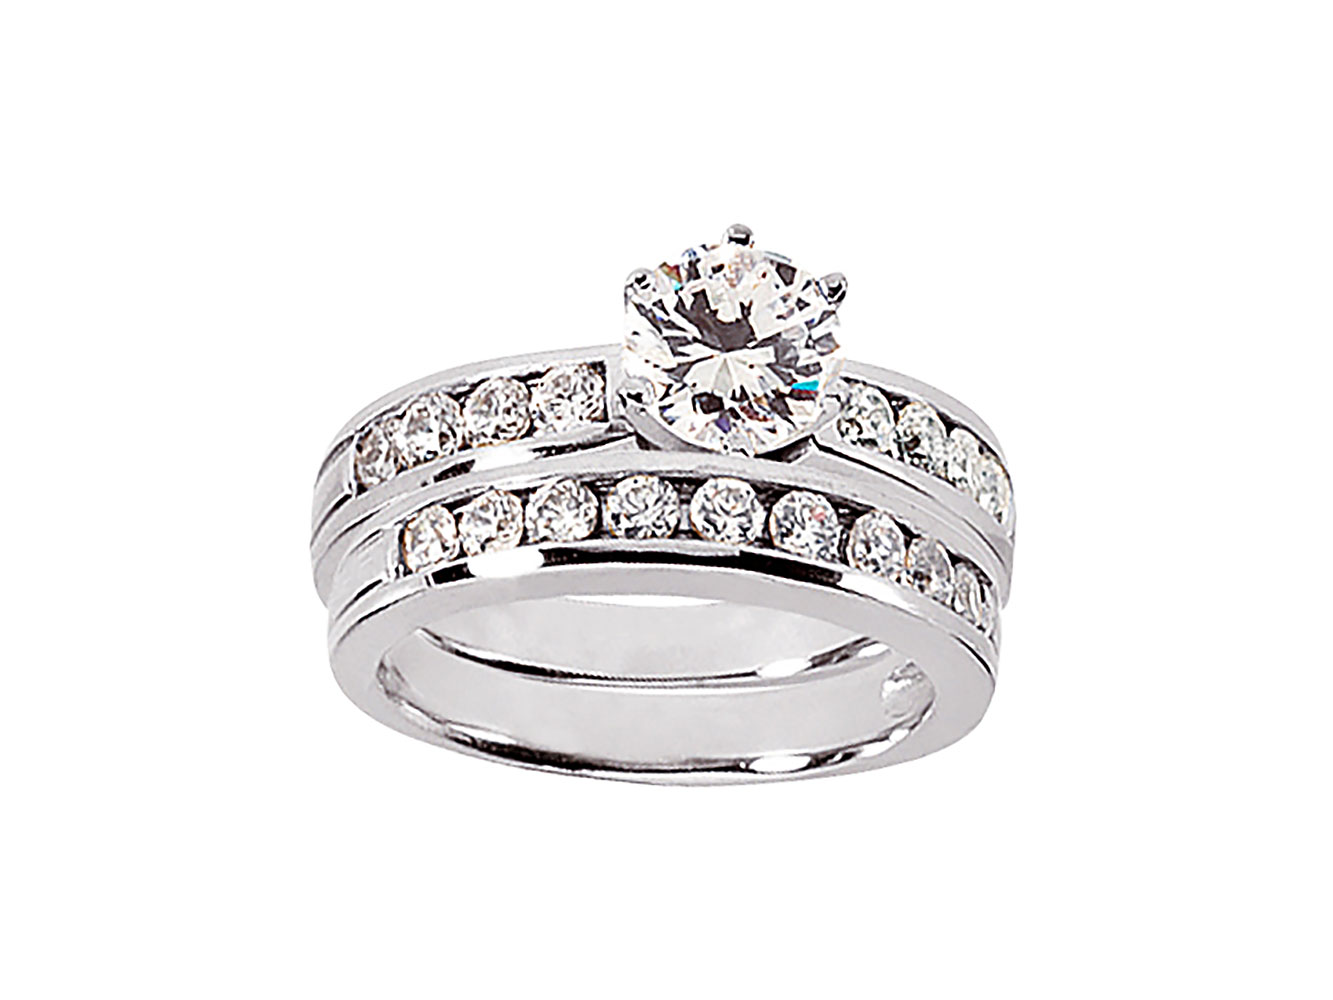 round cut diamond bridal engagement ring set solid. Black Bedroom Furniture Sets. Home Design Ideas